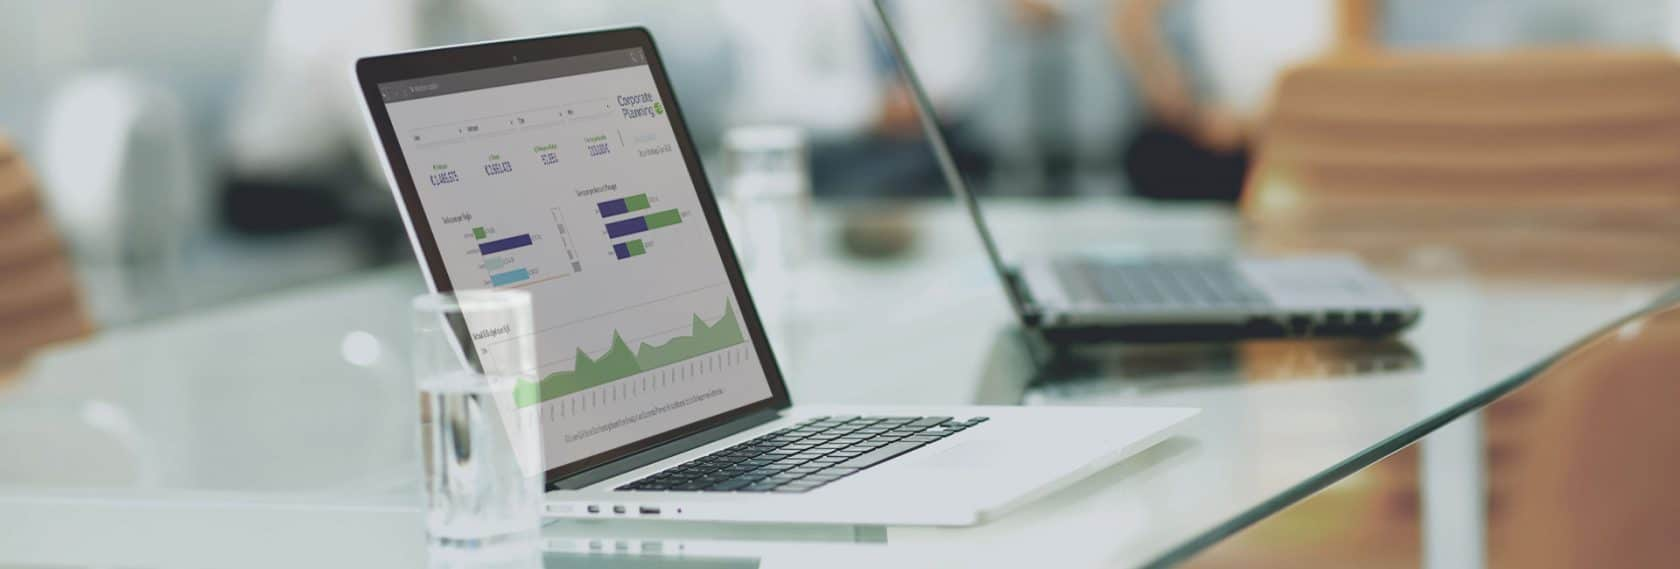 datadriven,datagedreven,datagestuurd, data driven, datadriven werken, qlik, analytics